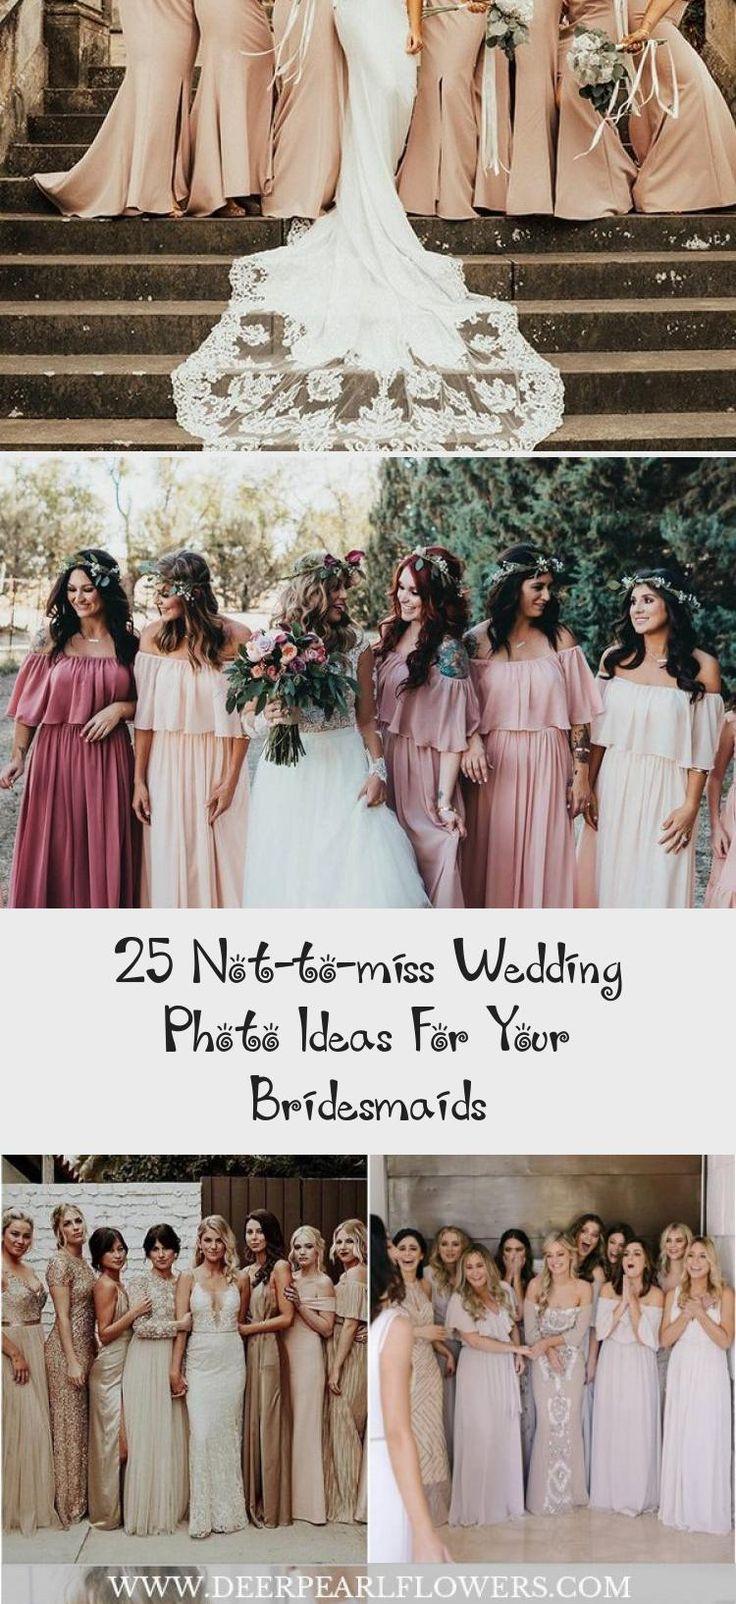 Wedding Photo Ideas For Your Bridesmaids  #wedding #weddingideas #weddingphotos #deerpearlflowers #MixAndMatchBridesmaidDresses #BridesmaidDressesHijab #IvoryBridesmaidDresses #SilverBridesmaidDresses #OrangeBridesmaidDresses